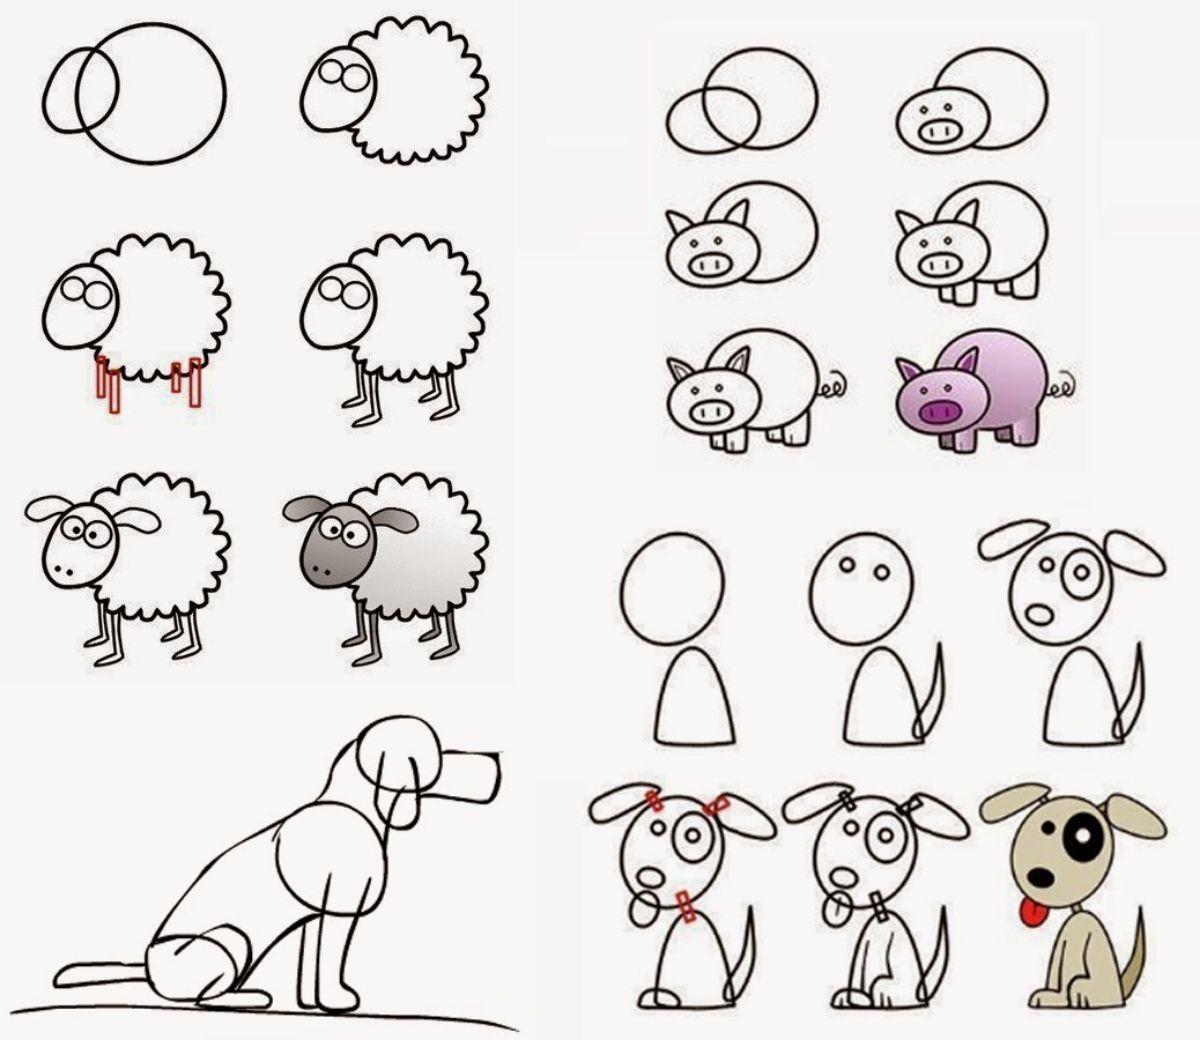 Como dibujar animales: las caras